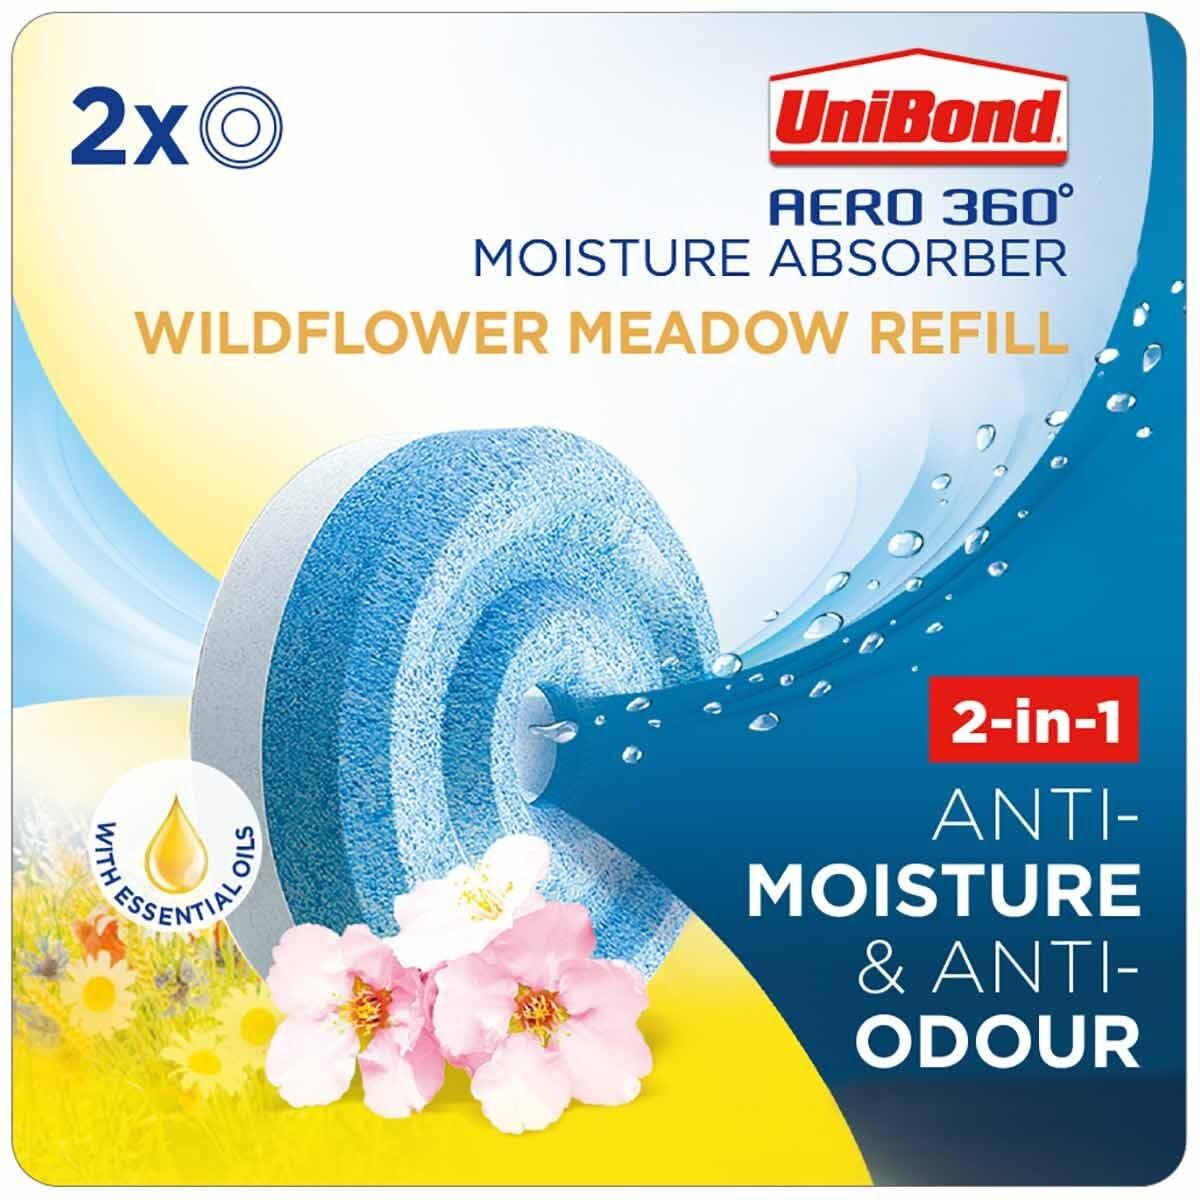 Unibond Aero 360 Moisture Absorber Wild Flower Meadow Refills Pack of 2